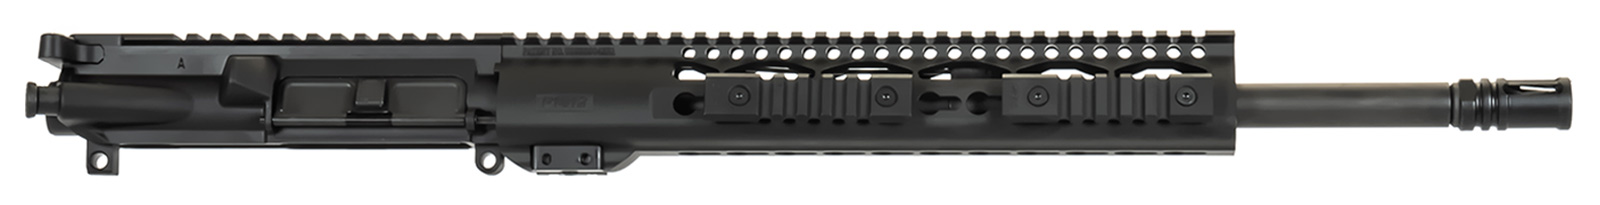 ar-15-upper-assembly-16-5-56-or-7-62-or-300-aac-blackout-12-cbc-keymod-tri-ar-15-handguard-rail